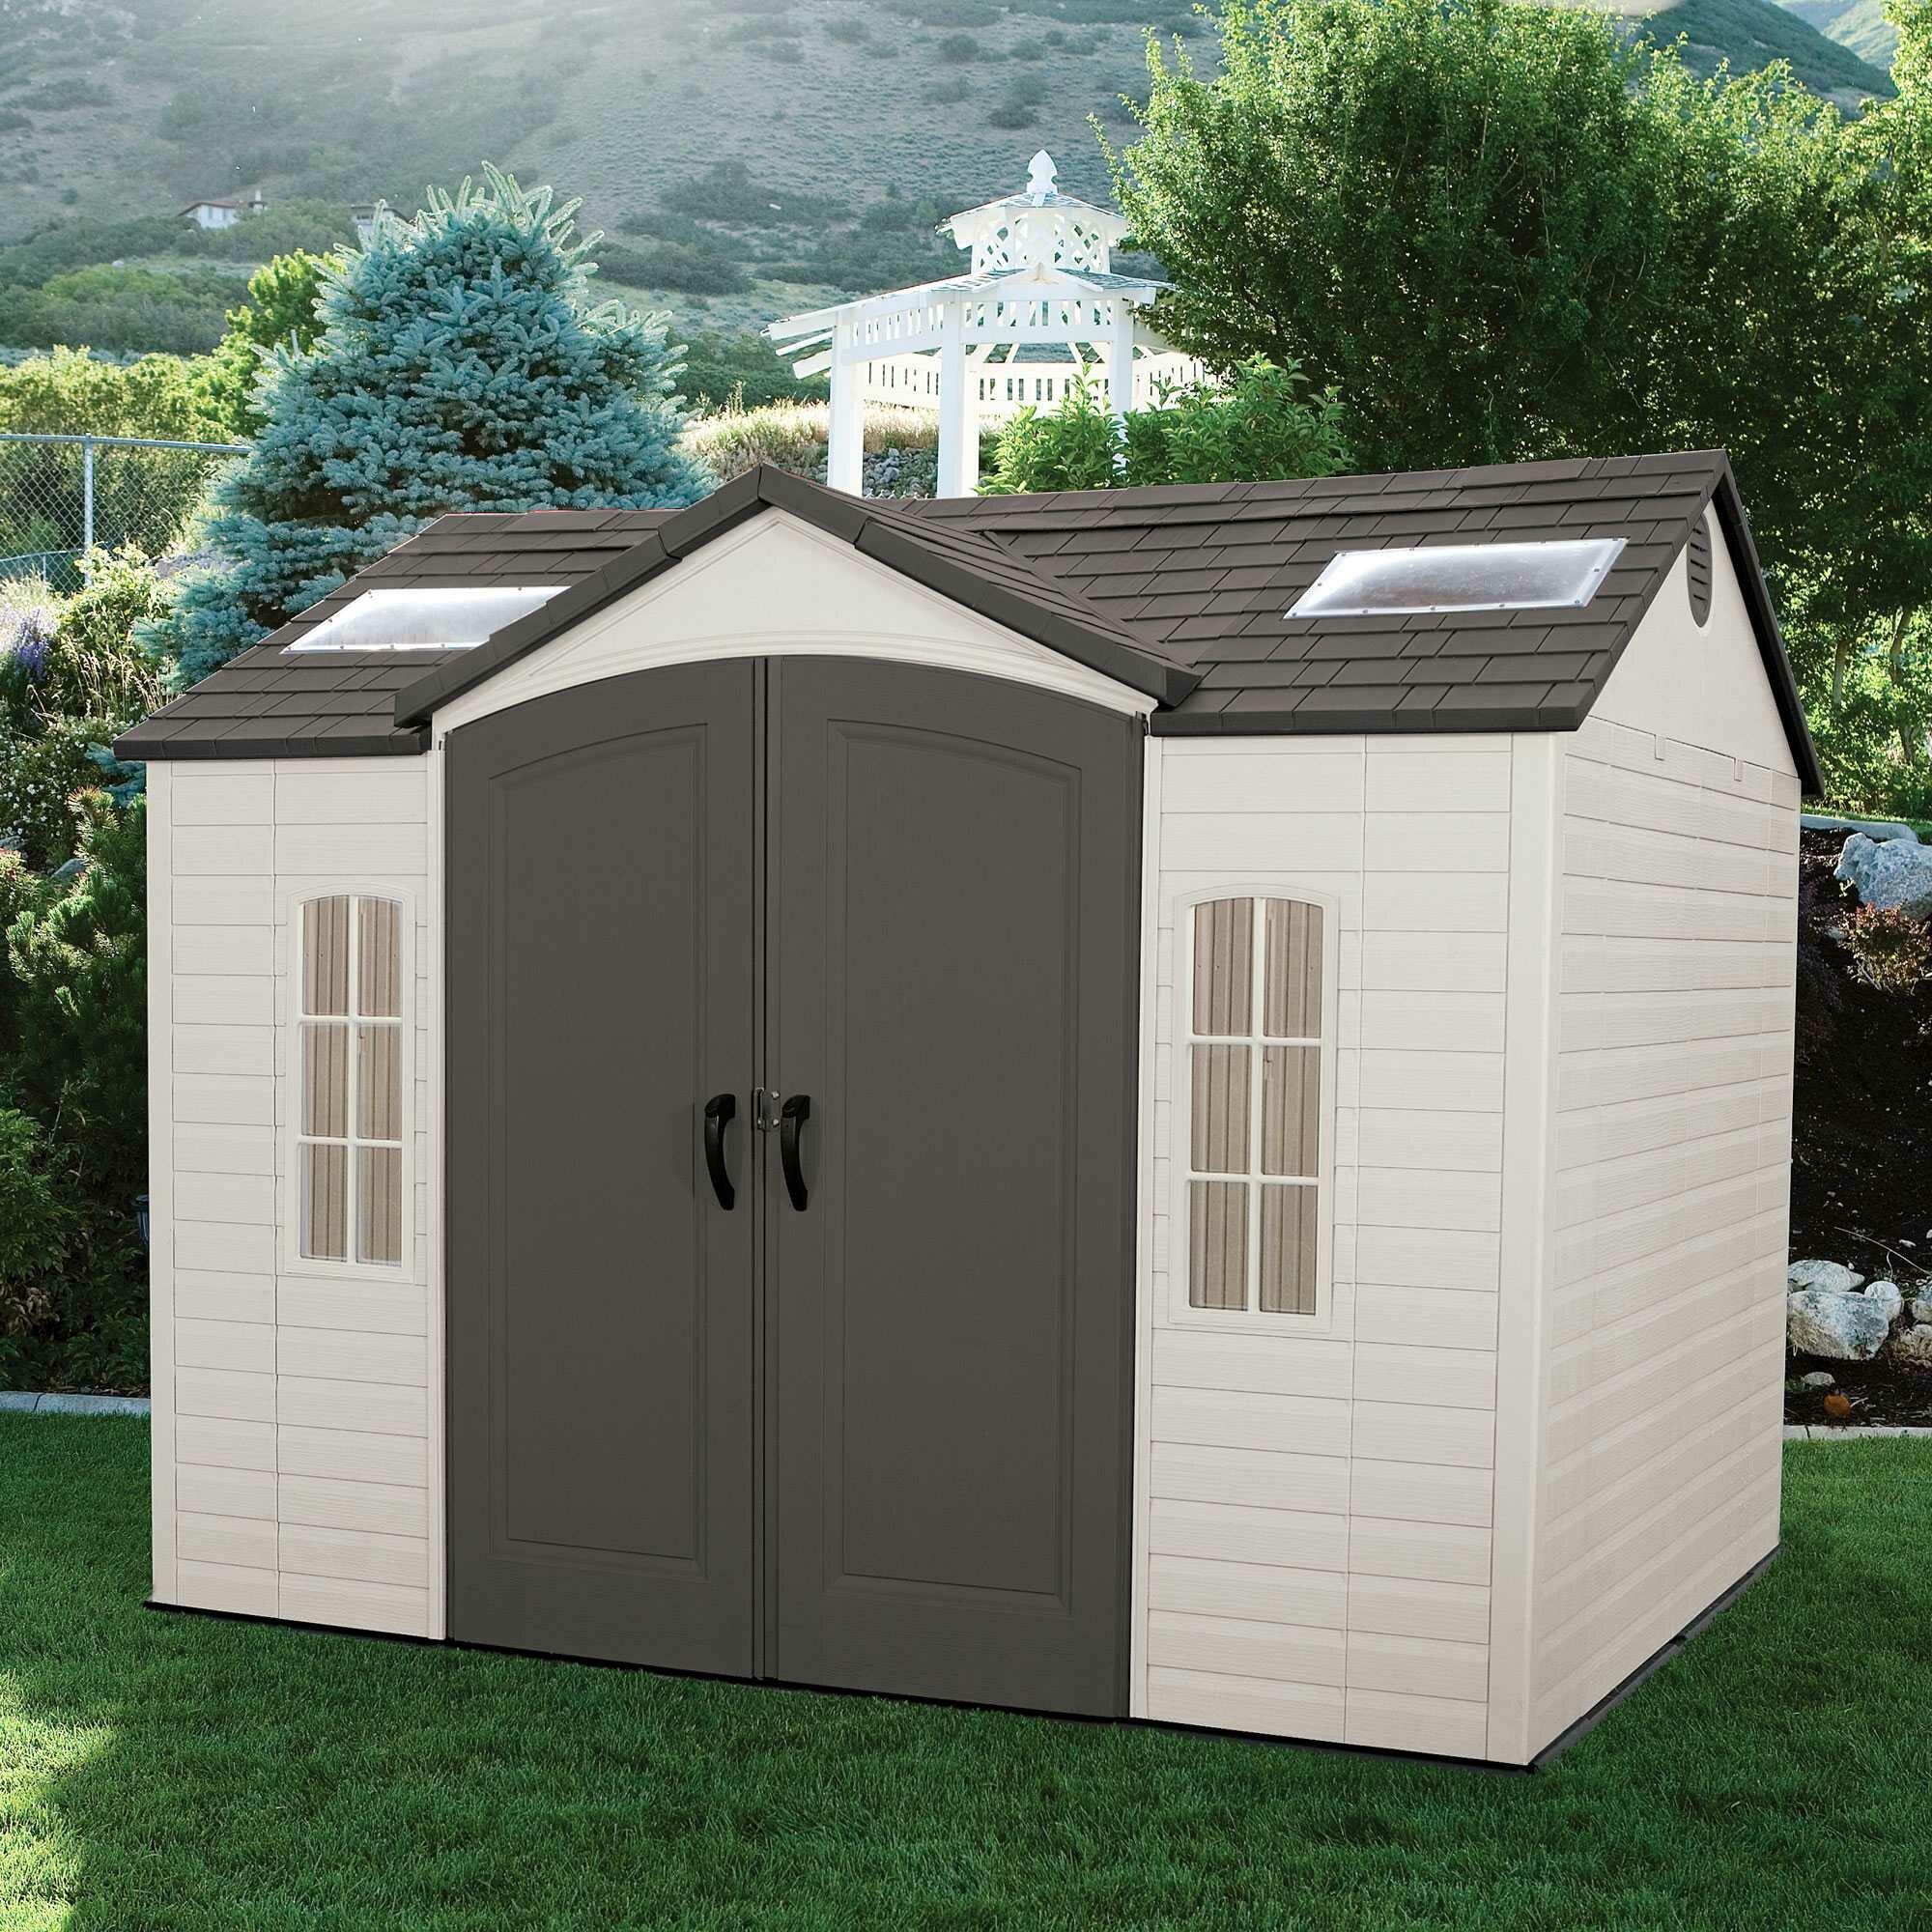 Lifetime Side 10 Ft W X 8 D Steel Reinforced Polyethylene Storage Shed Reviews Wayfair